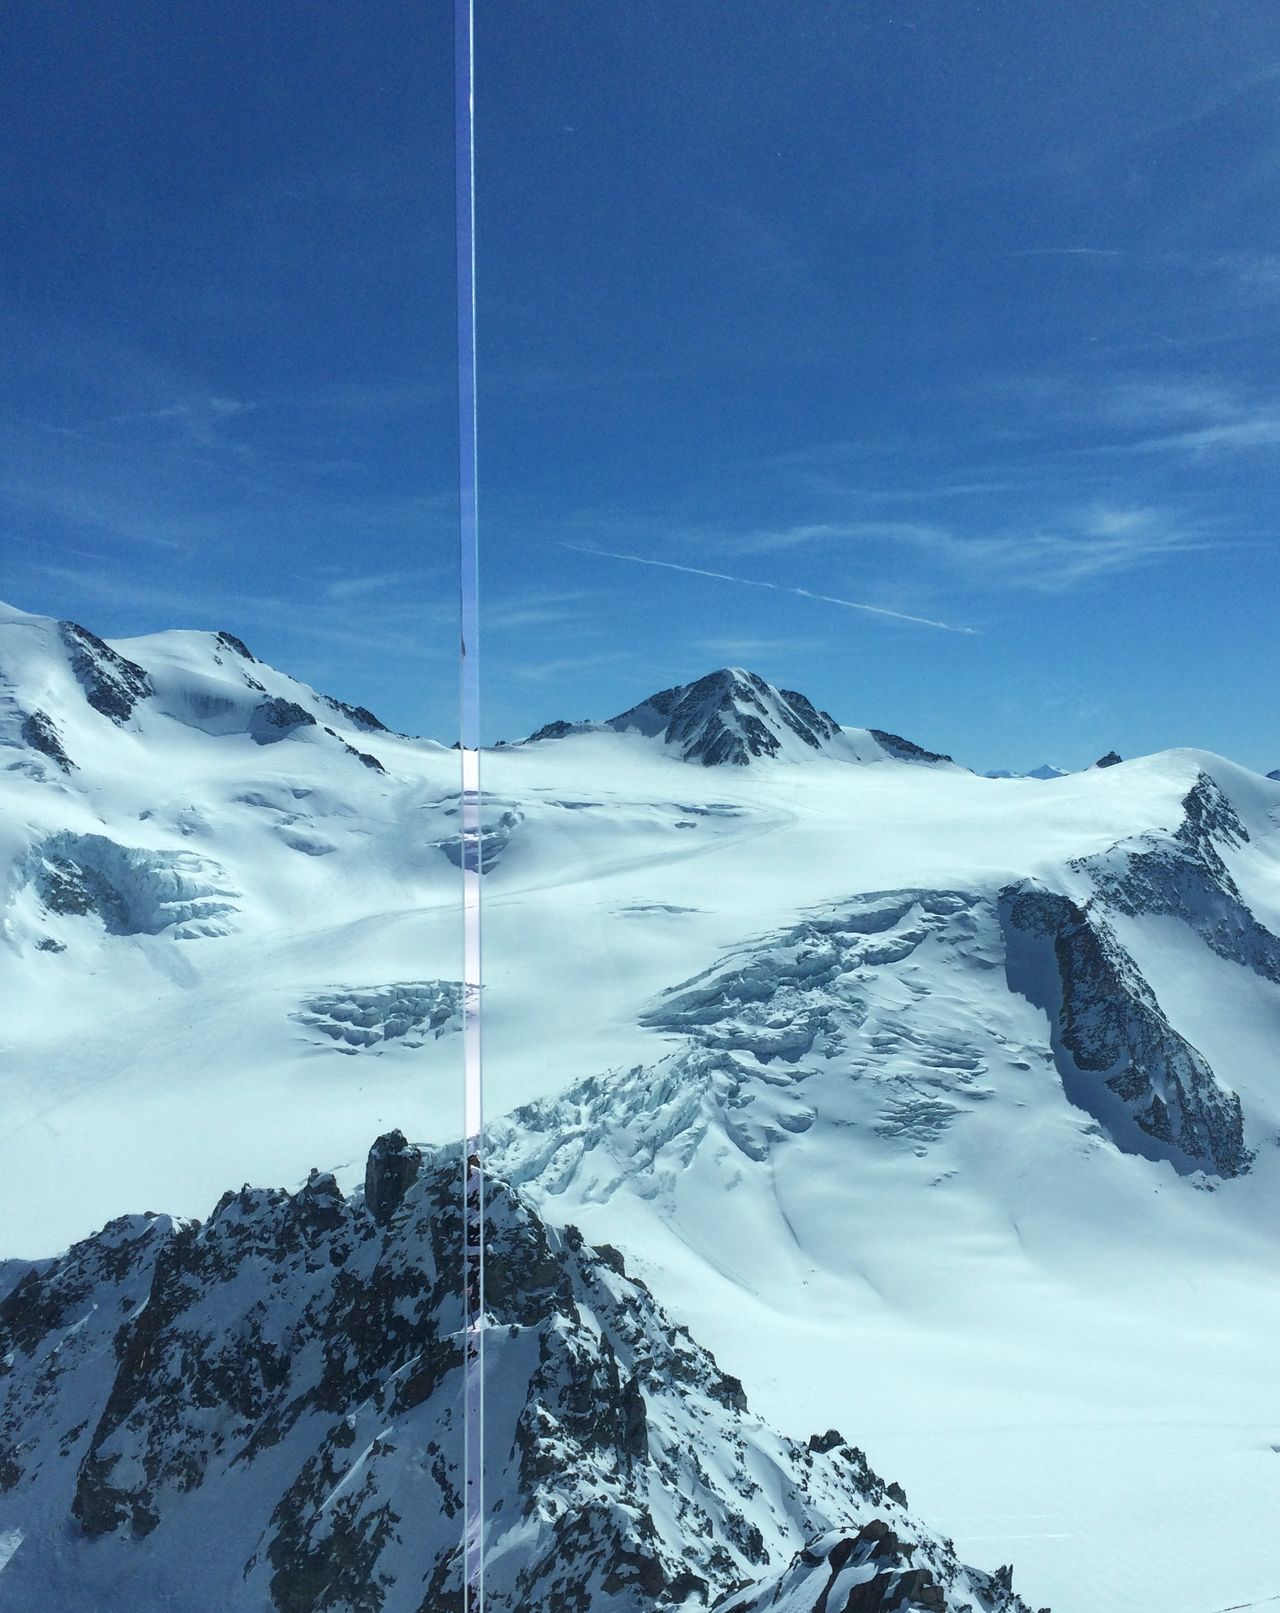 Cobalt Blue By Motorola Enjoying The View Pitztaler Gletscher Restaurant in 3440 m RePicture Travel Ice Age